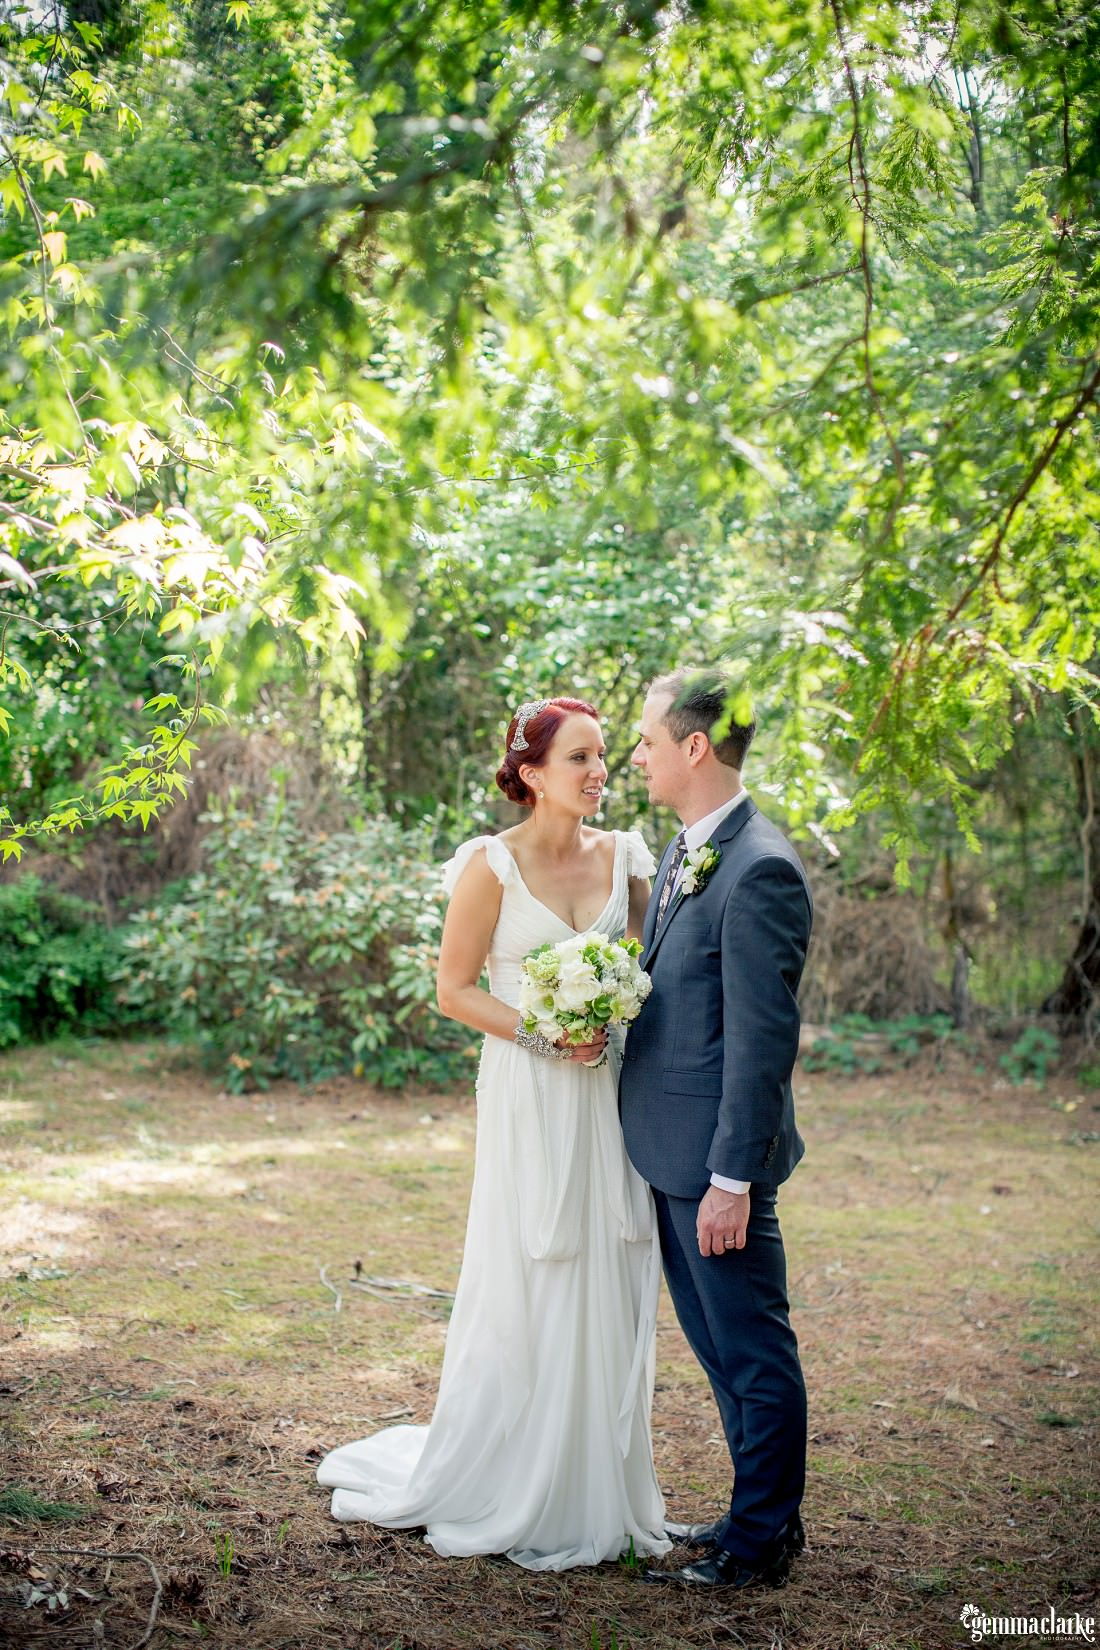 gemma-clarke-photography_southern-highlands-wedding_biota-dining-wedding_ashley-and-hally_0049